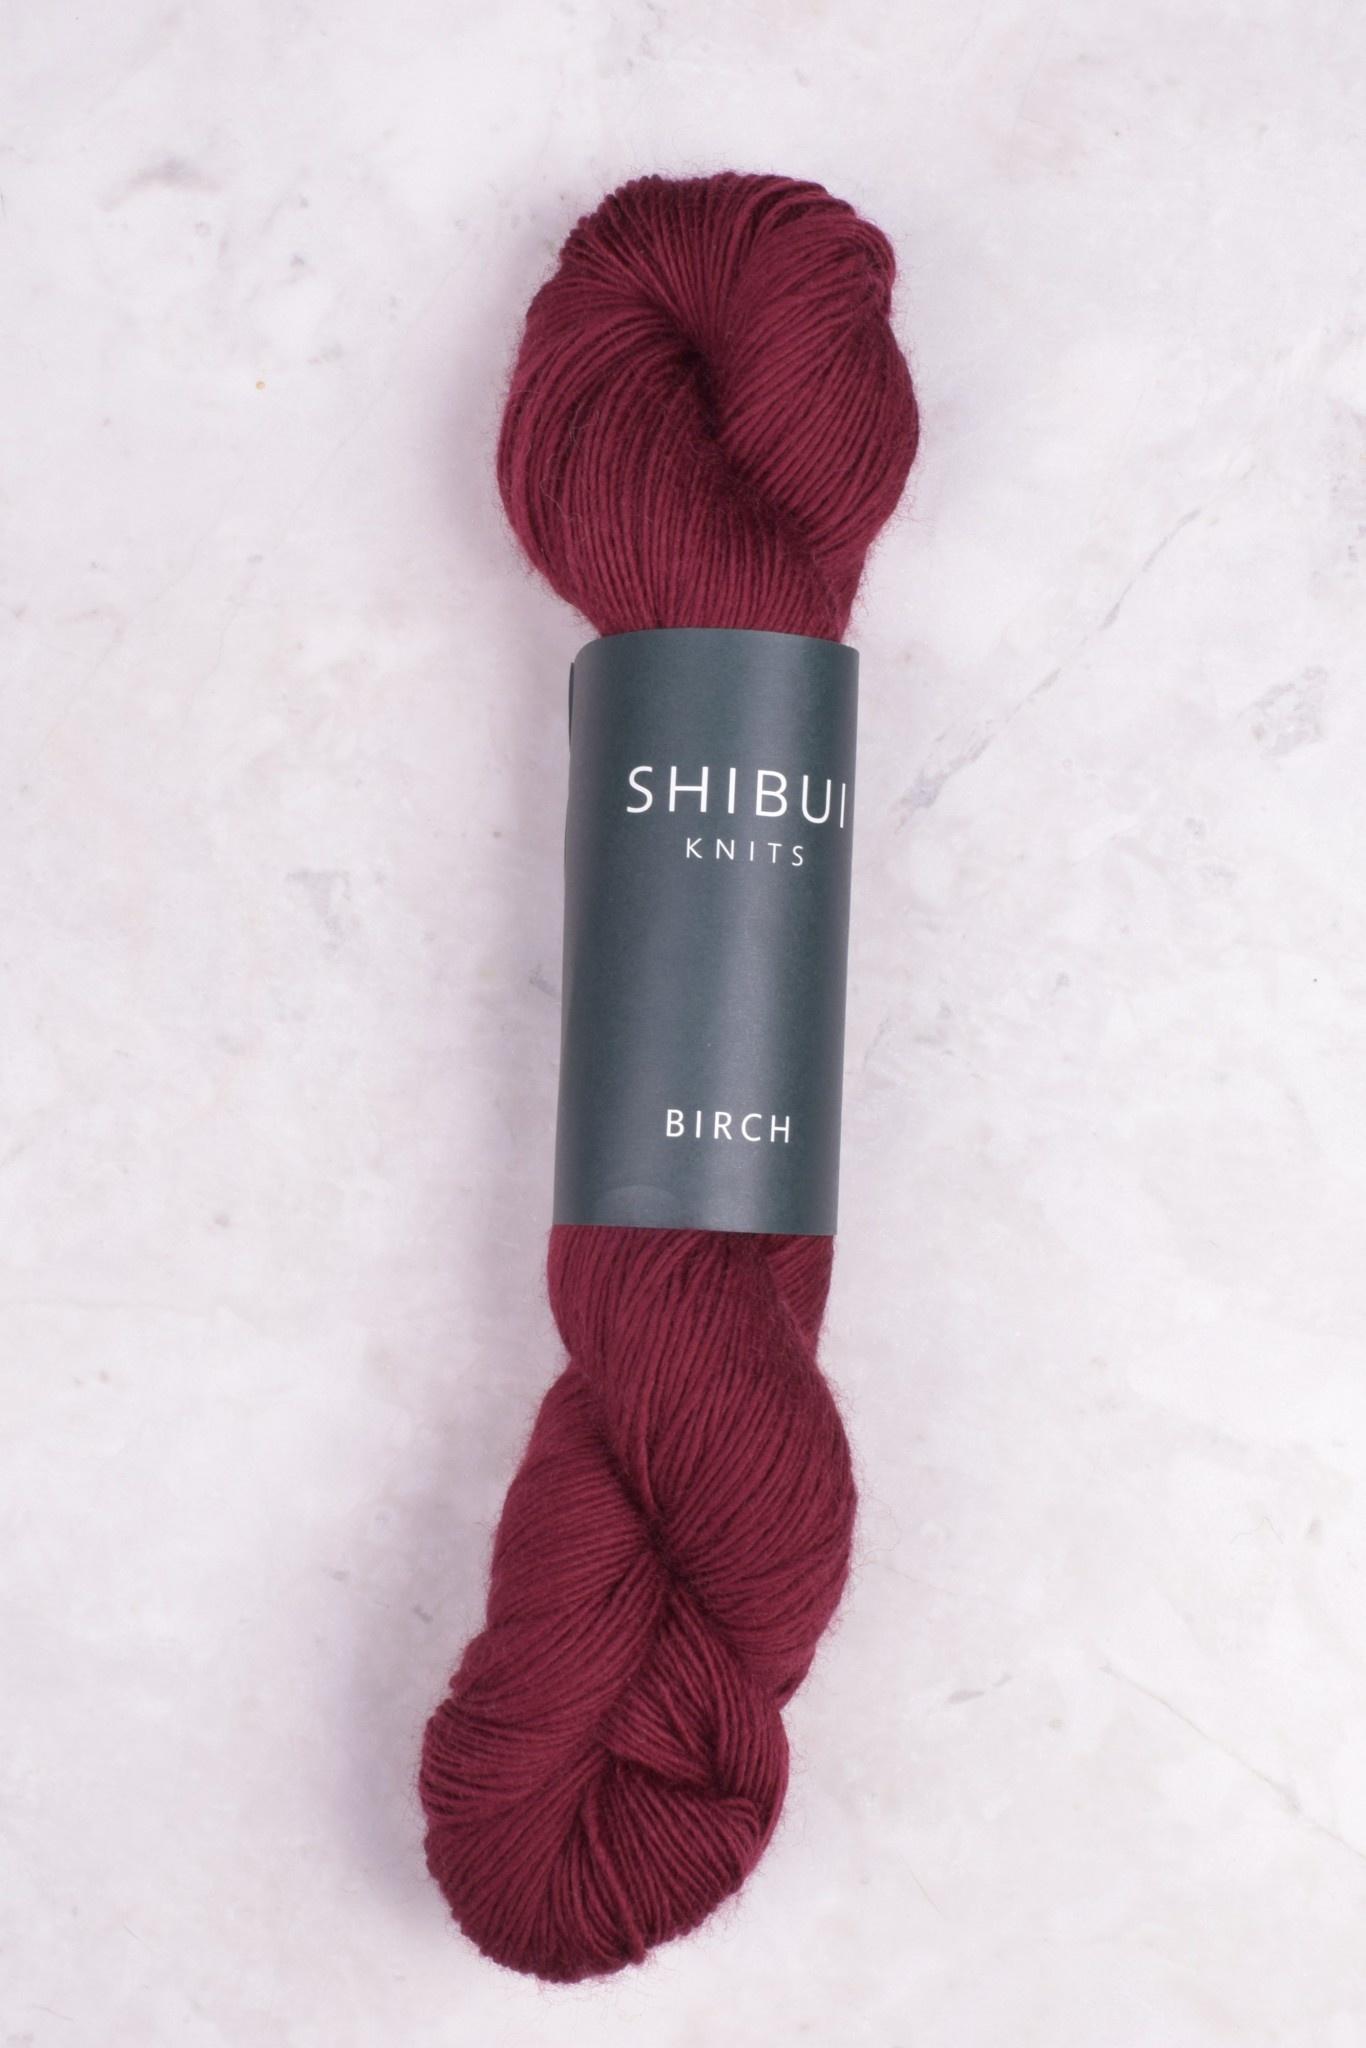 Image of Shibui Birch 2018 Bordeaux (Discontinued)